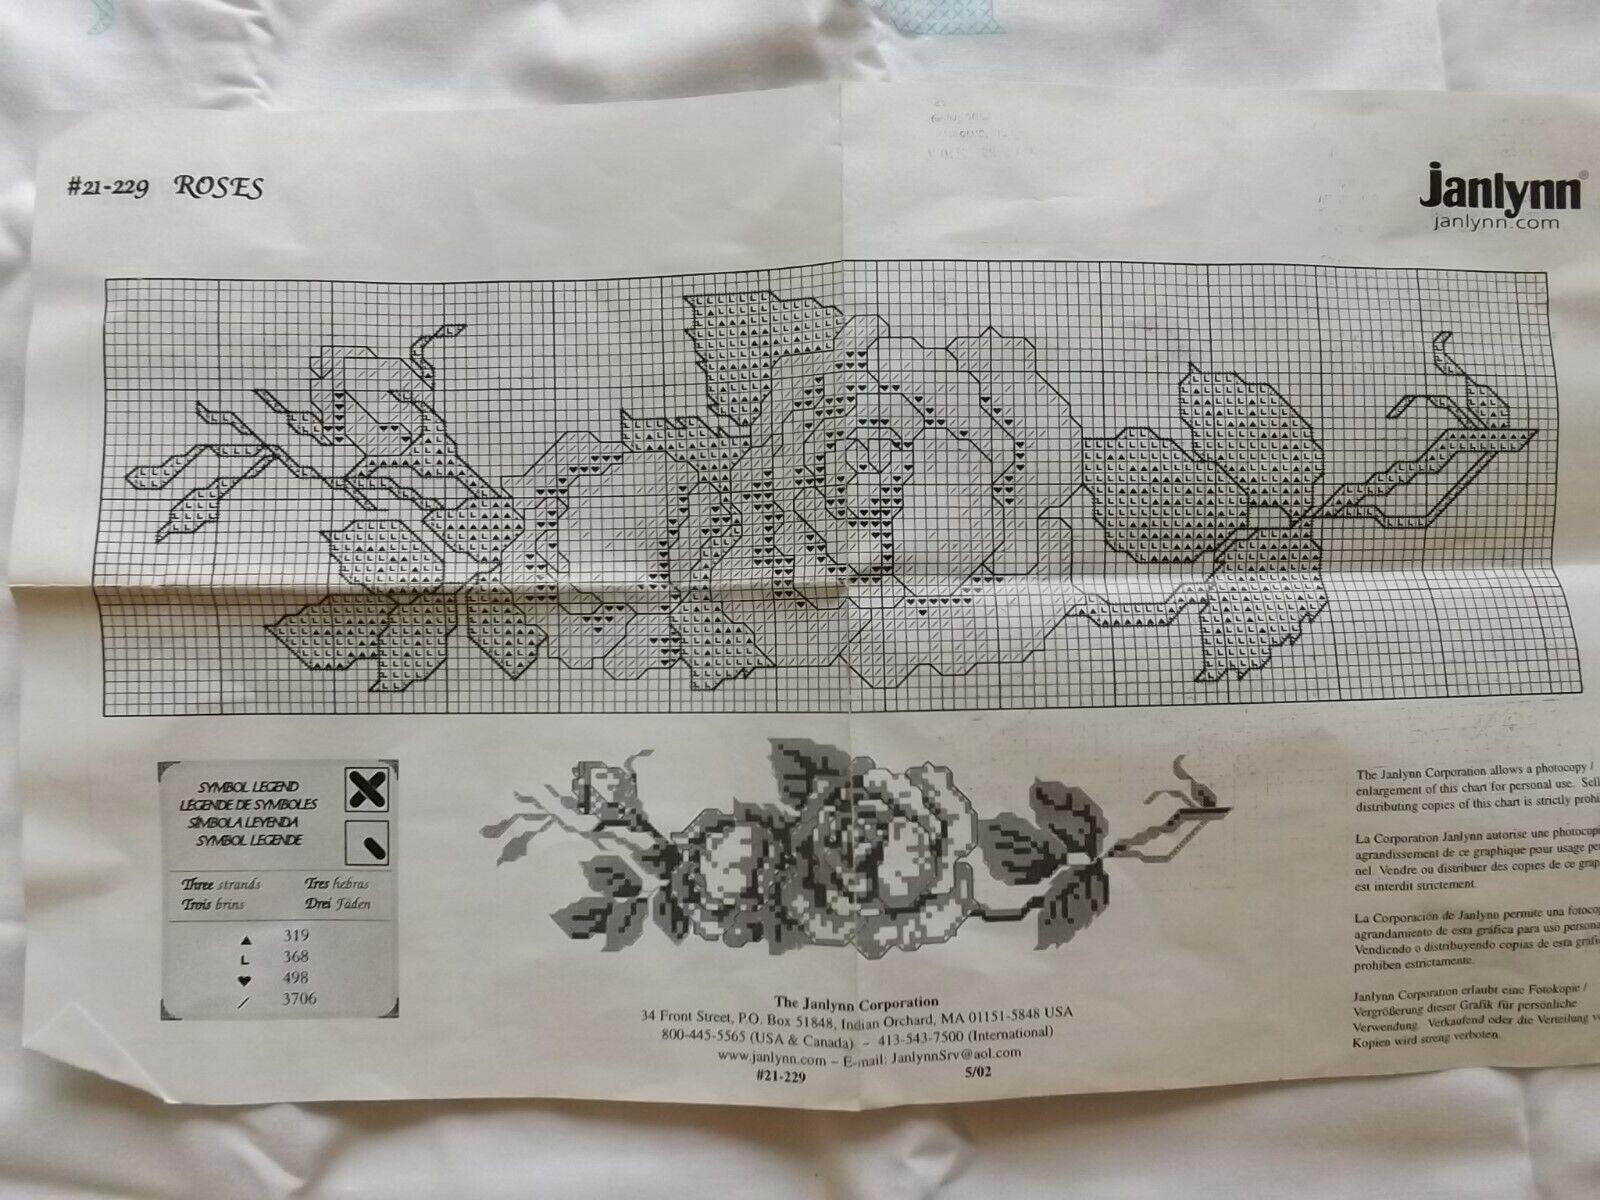 VTG Janlynn Stamped Cross Stitch Pillowcases  Roses #21-229